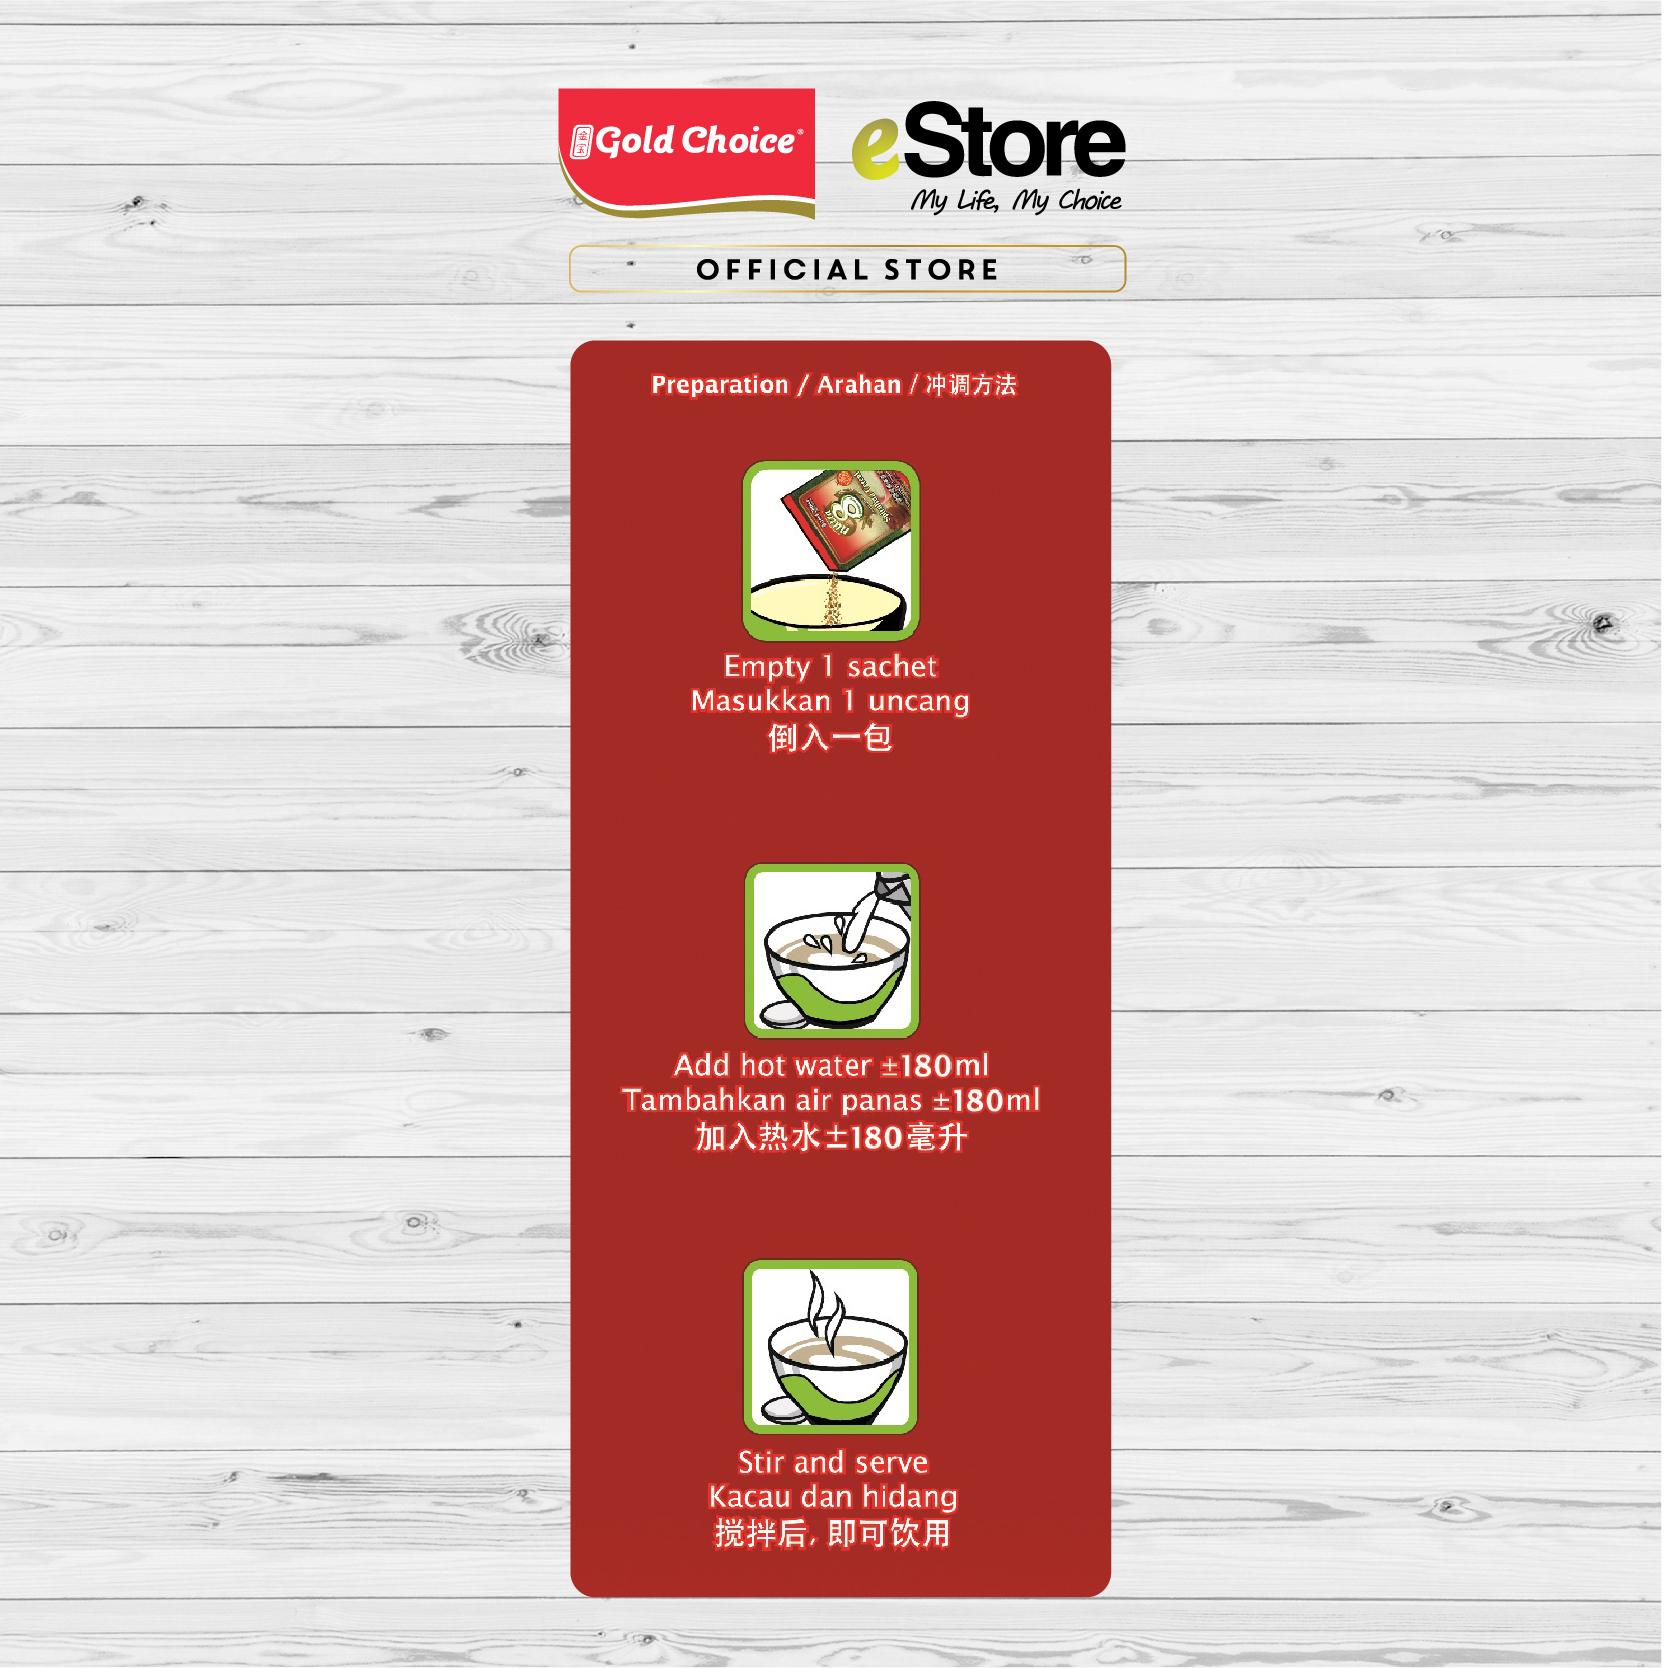 GOLD CHOICE NUTRA 8 Spirulina Cereal No Sugar - (30g x 15'S) X 6 Packs Bundle